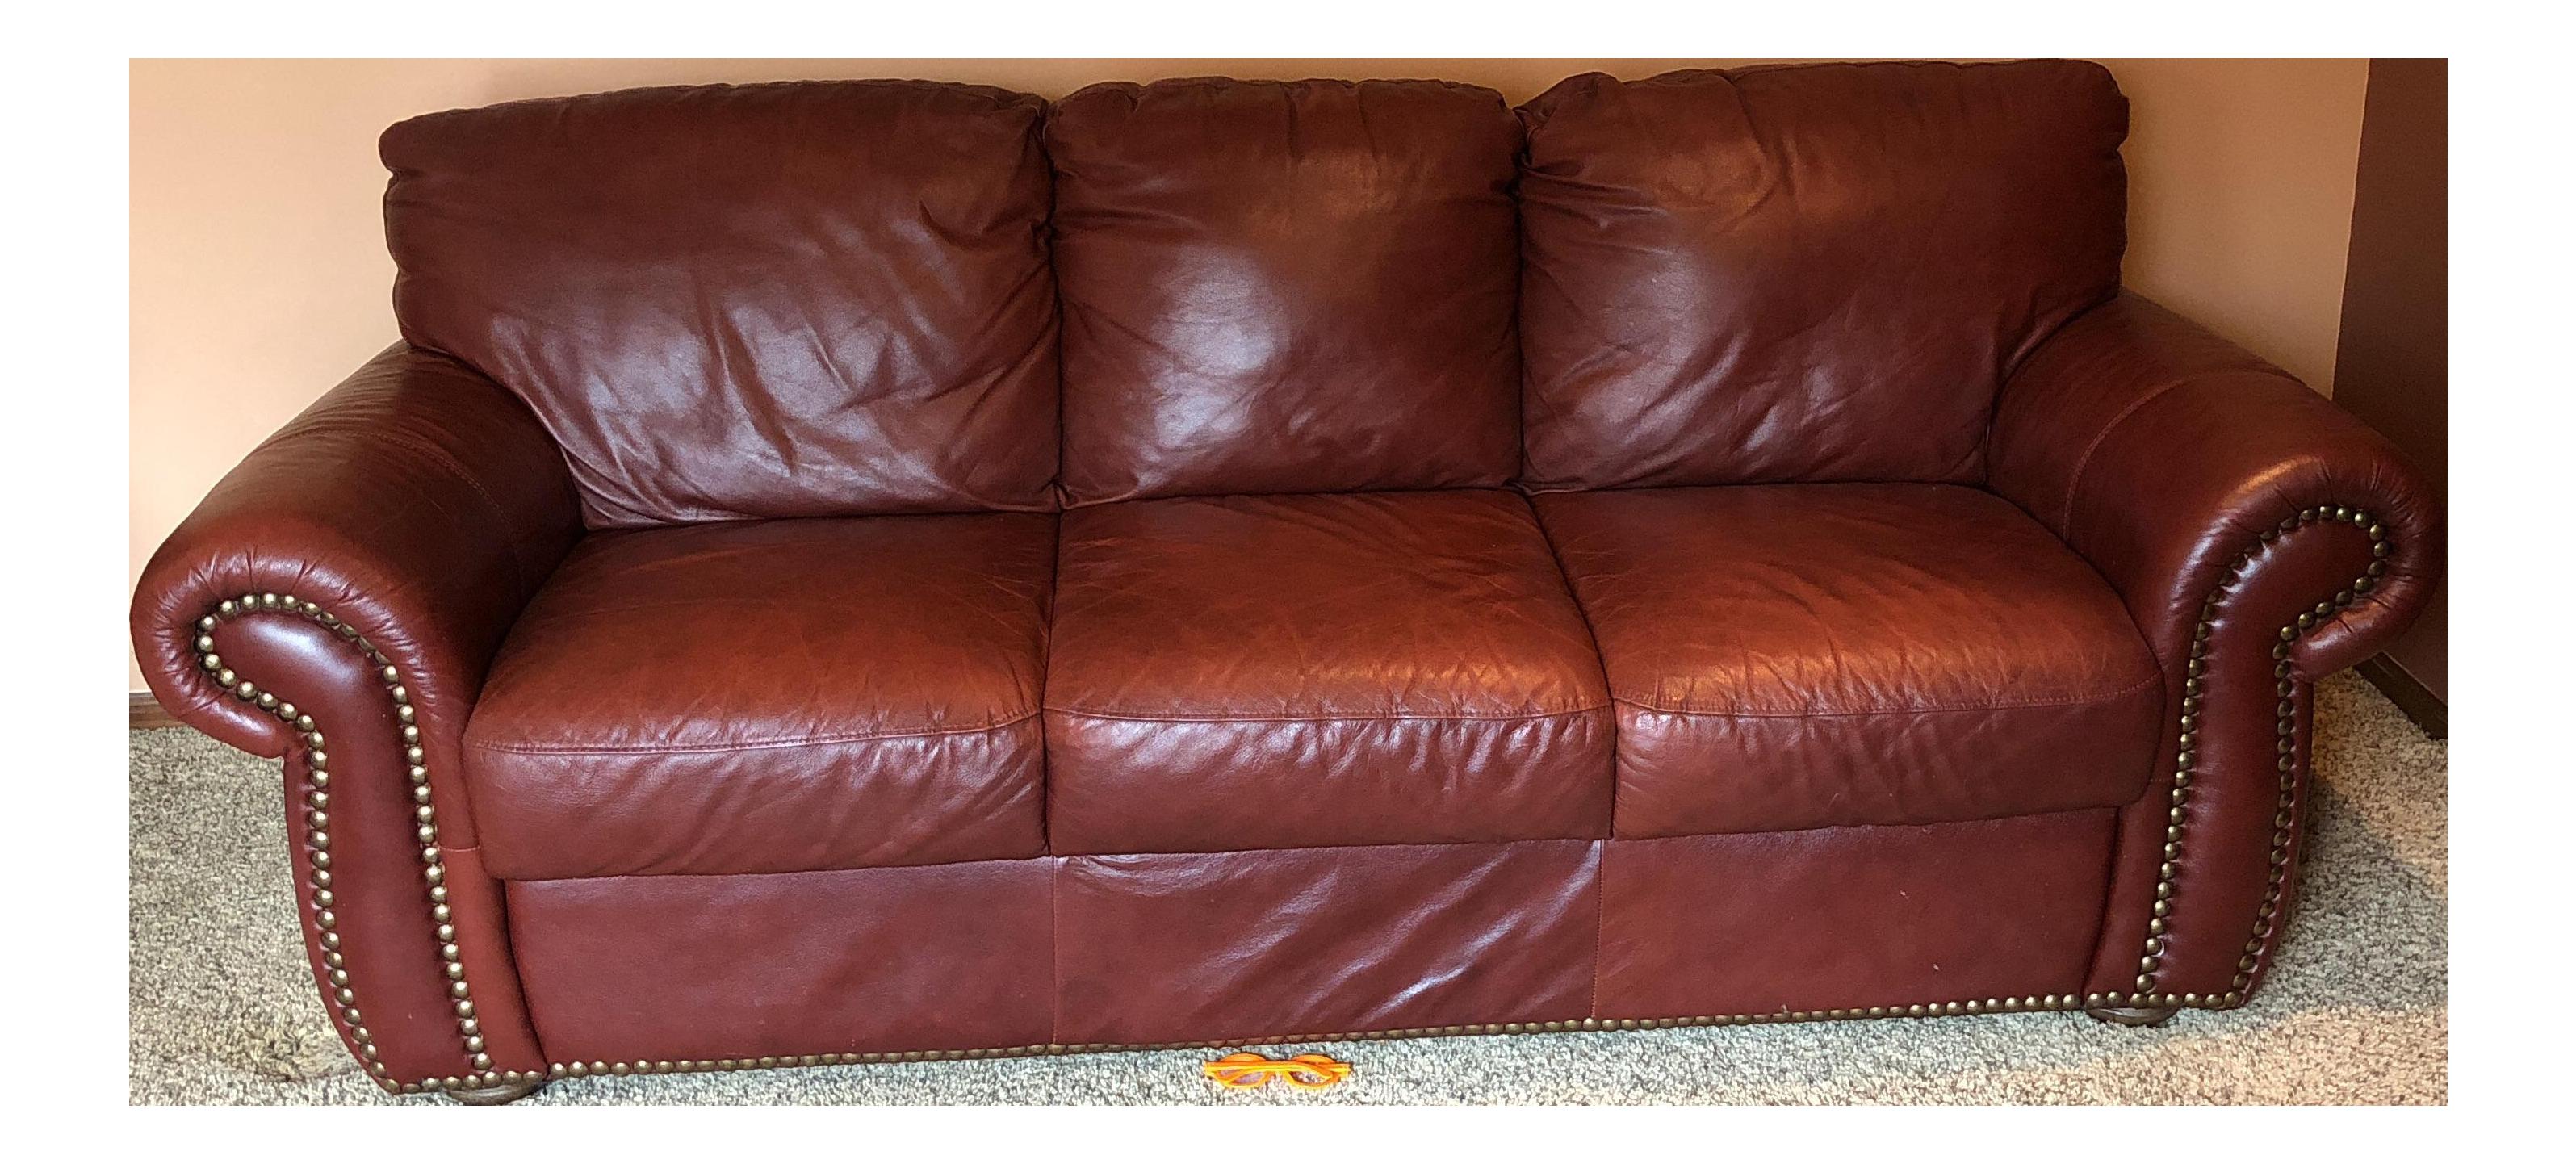 Chateaux D Ax Divani.Chateau D Ax Divani Italian Red Leather Sofa Chairish